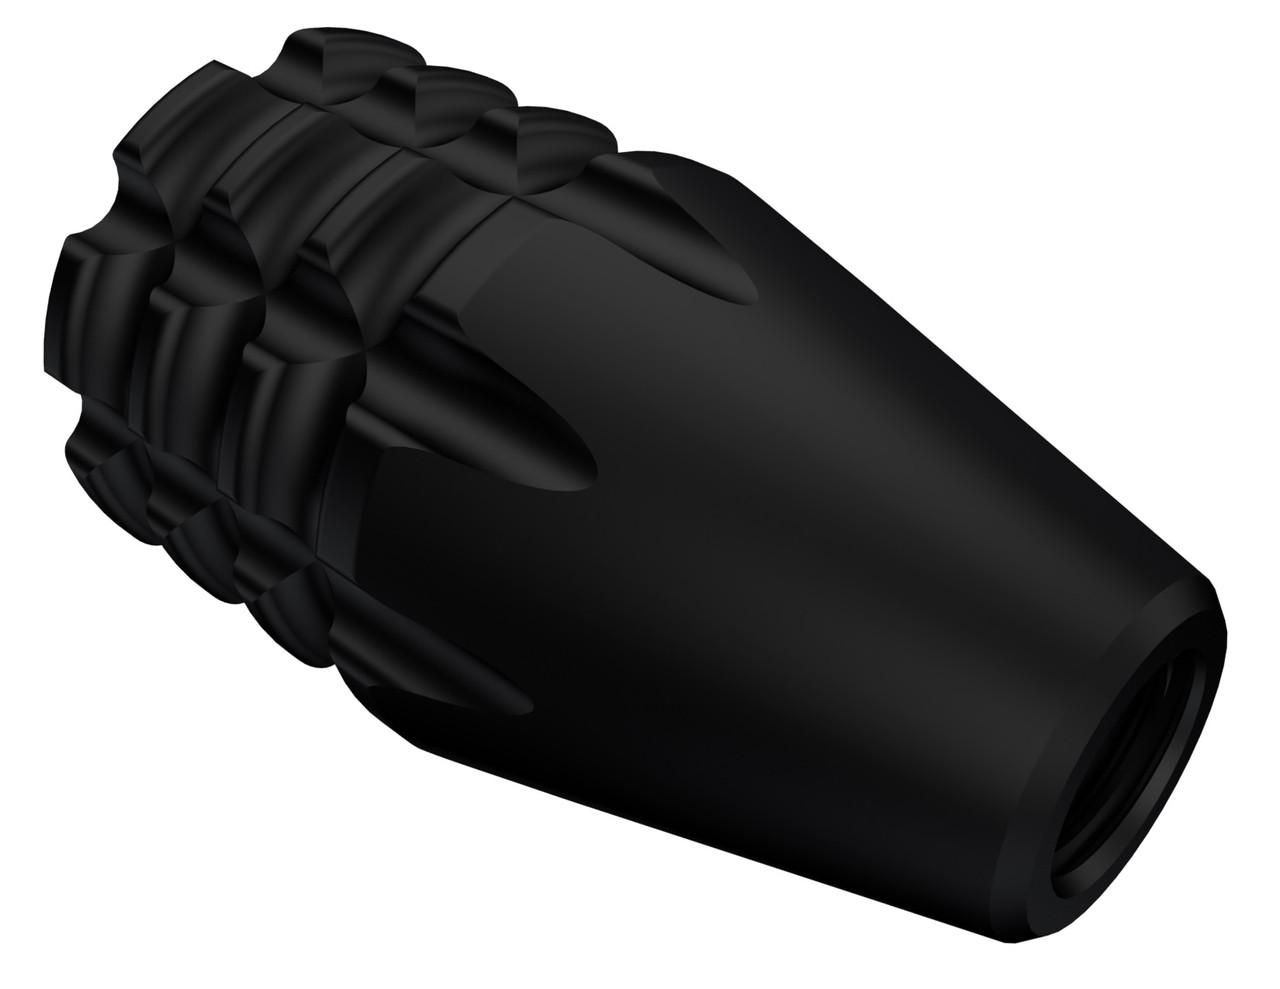 "Rowe Tactical Remington 700 Bolt Knob B 5/16""-24 - Black Hard Anodized T6 Aluminum"